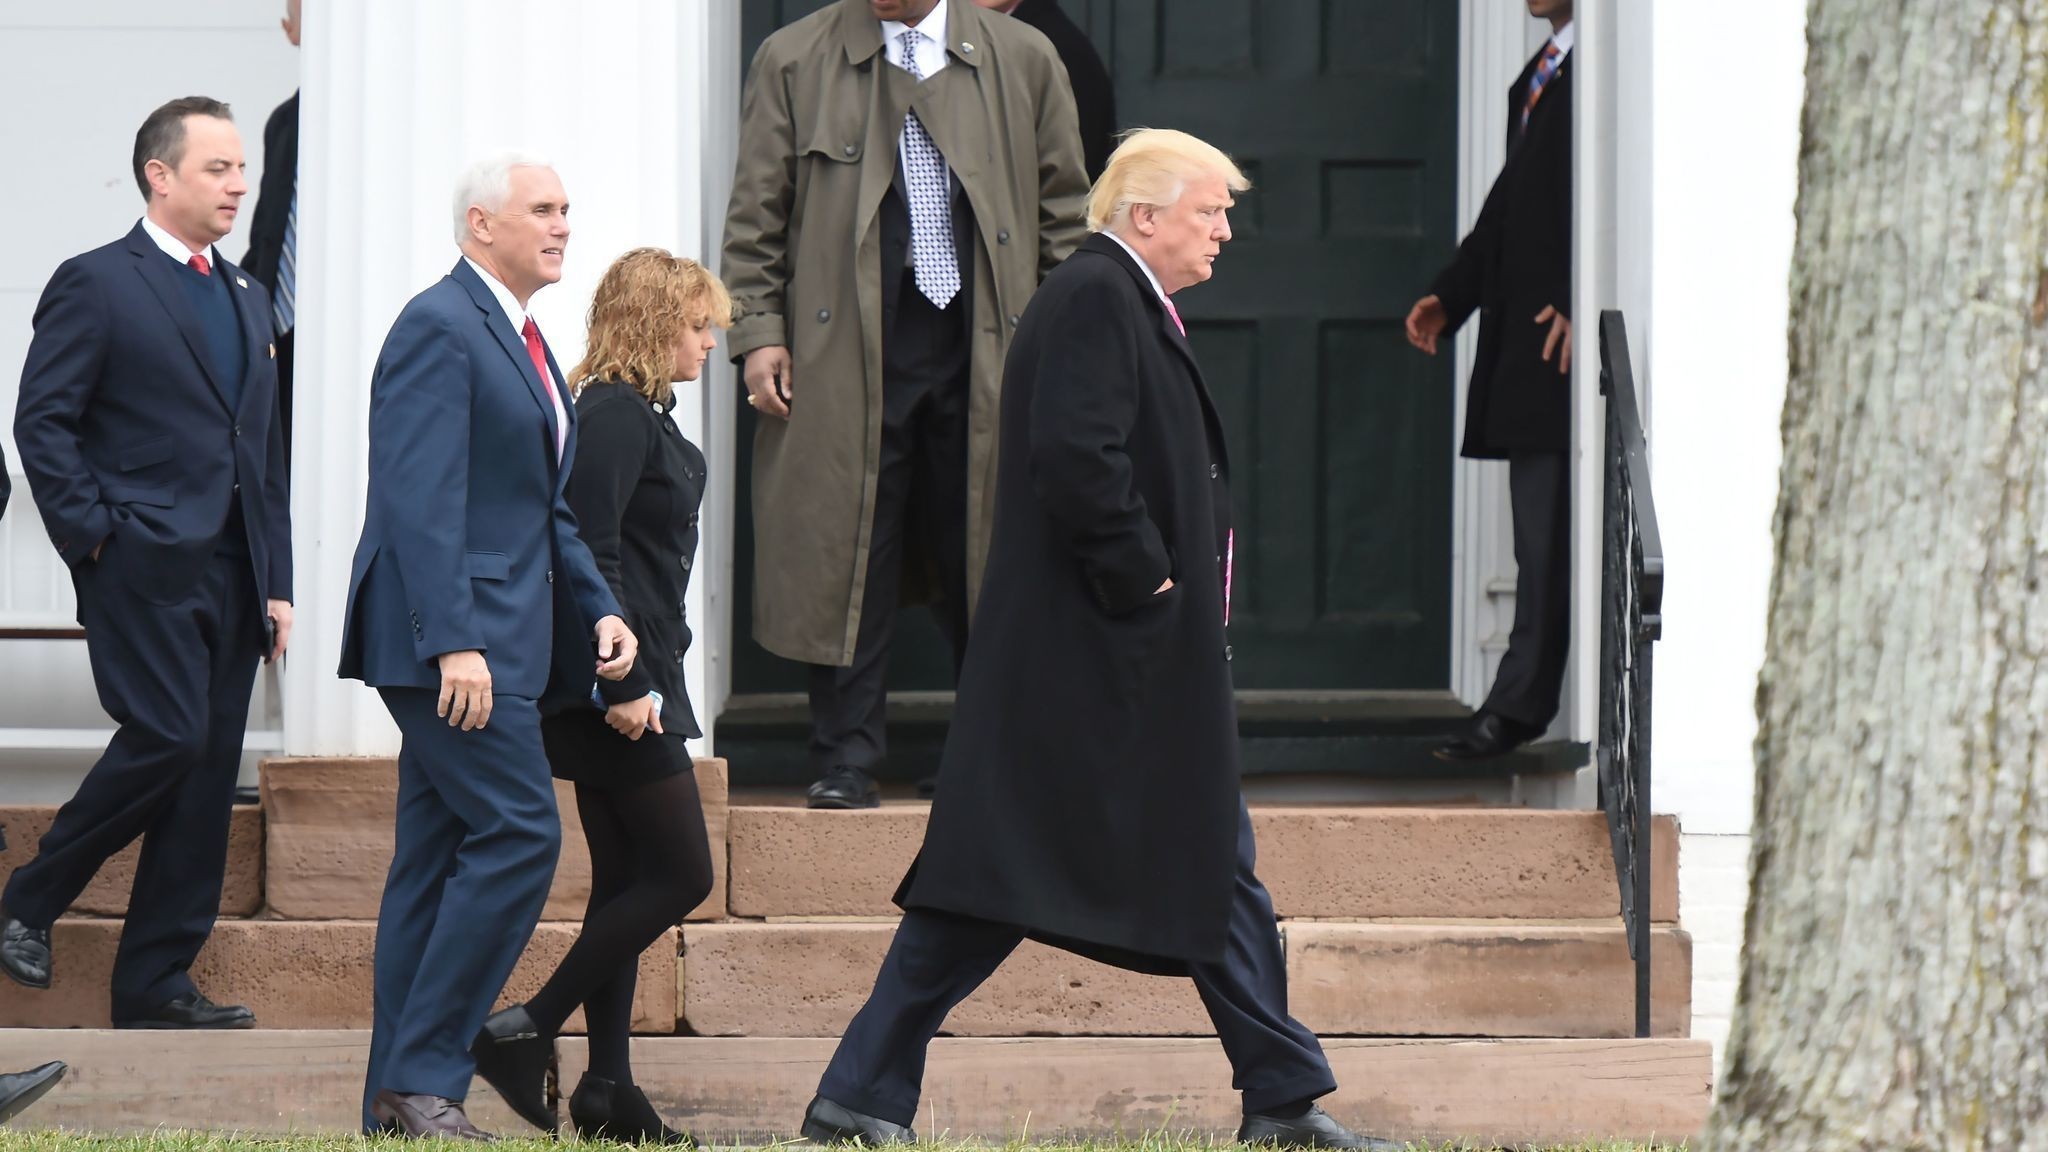 la-na-pence-trump-cabinet-20161120